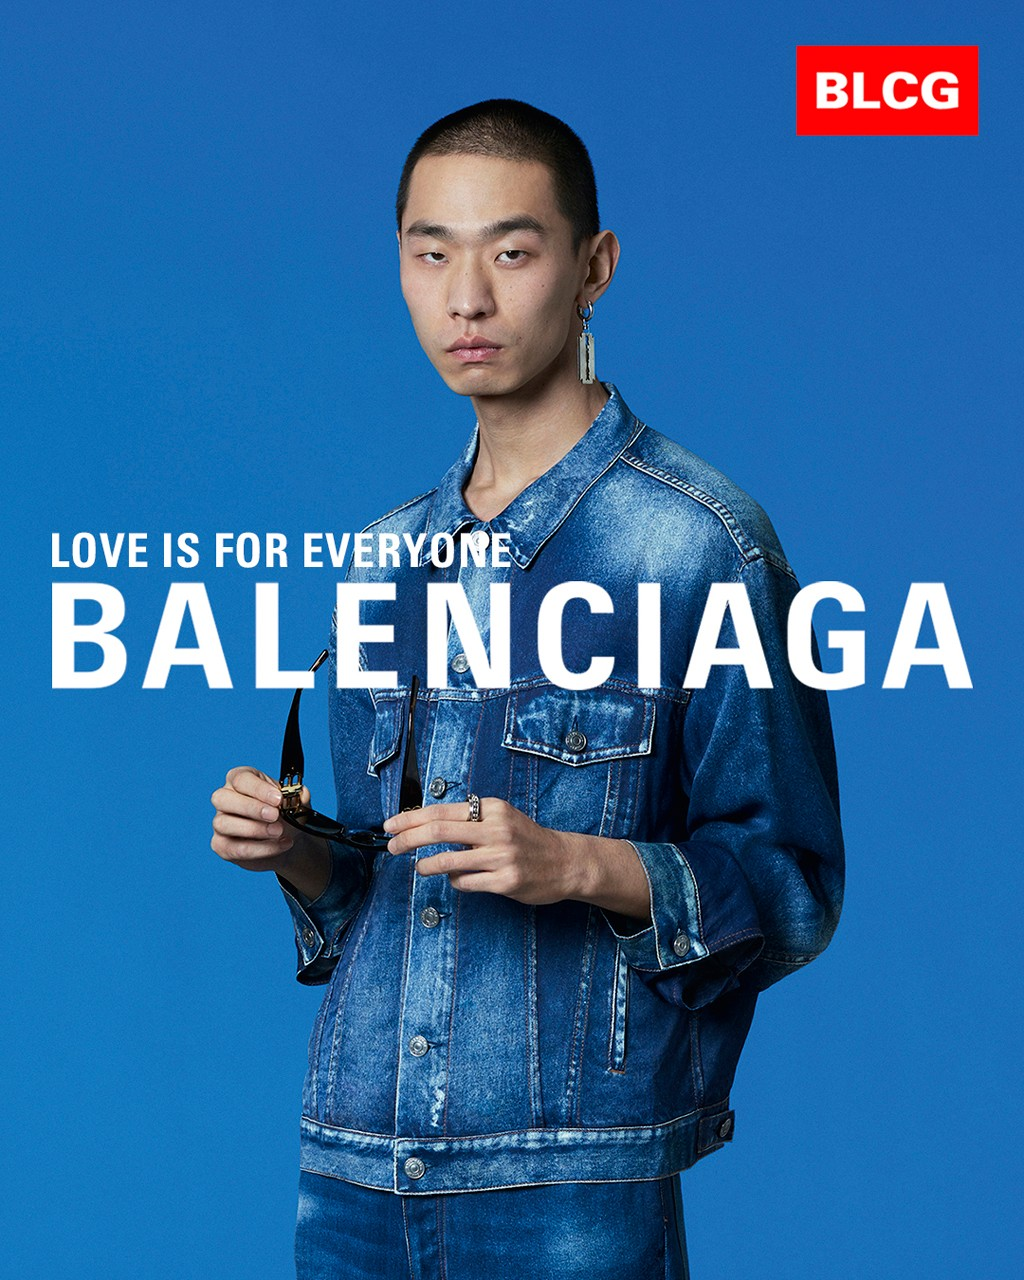 balenciaga new campaign